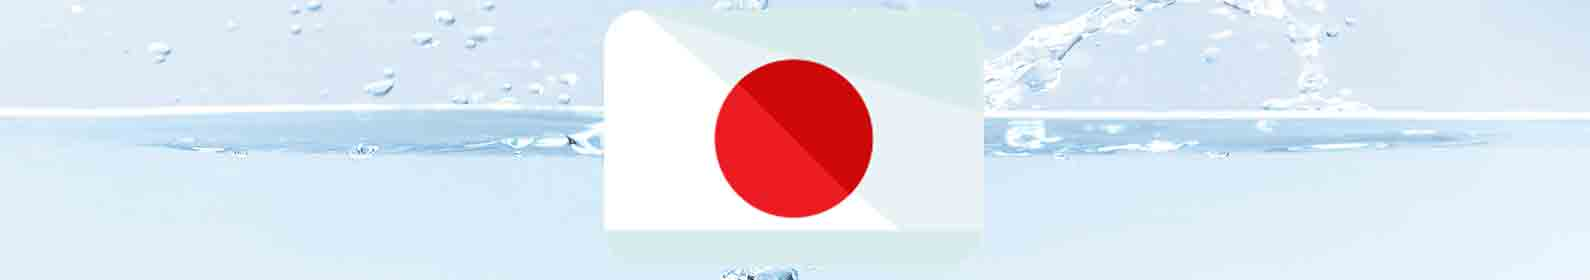 water-treatment-japan.jpg